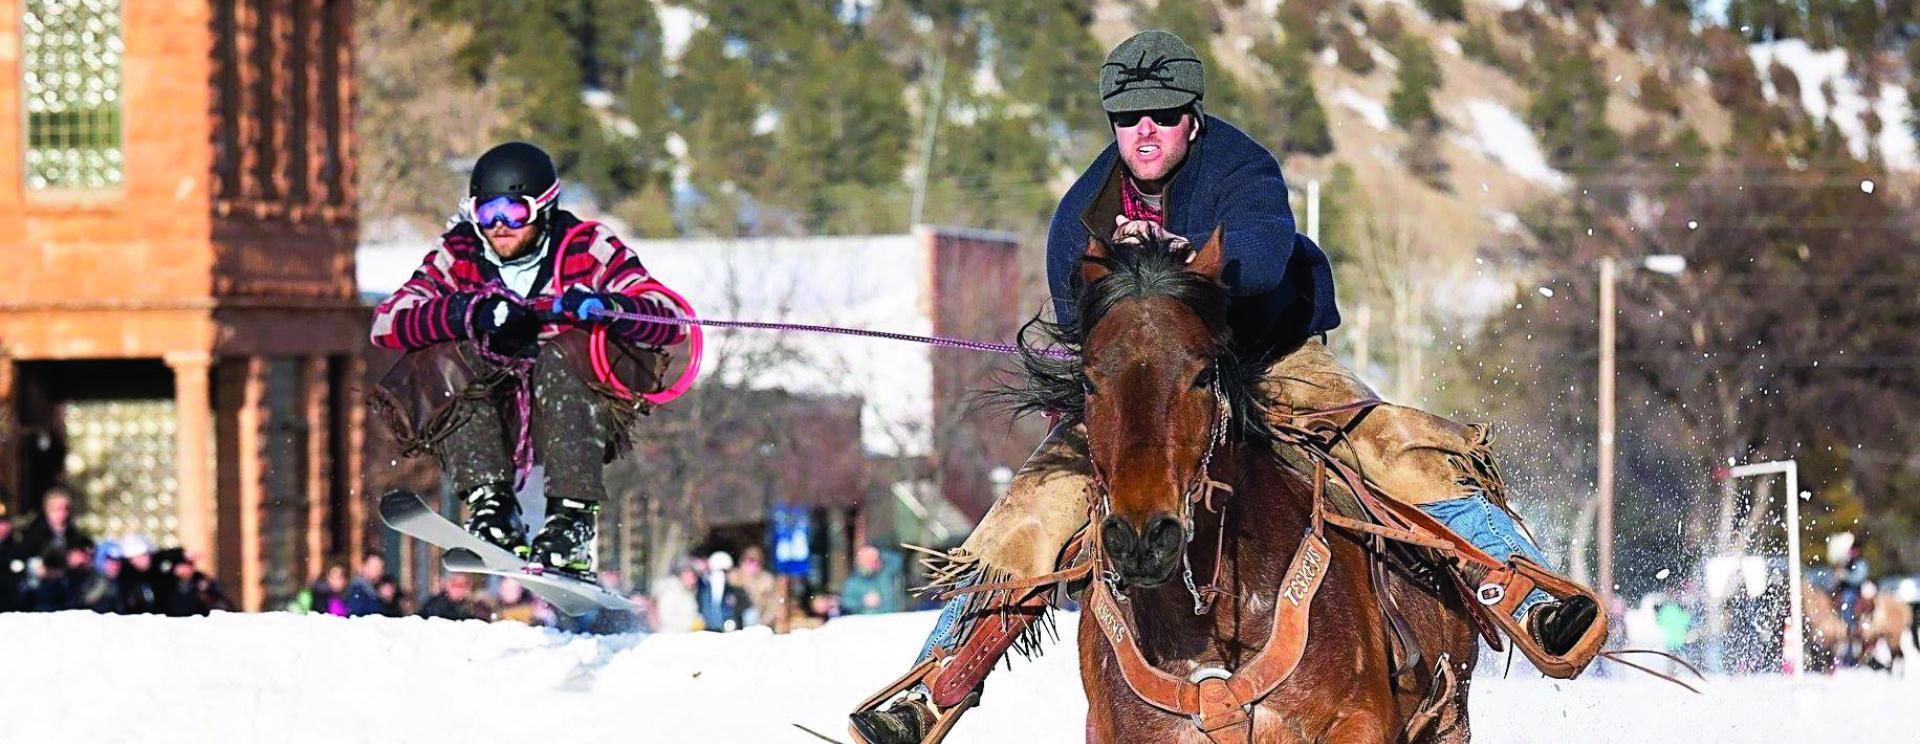 Sundance Winter Festival